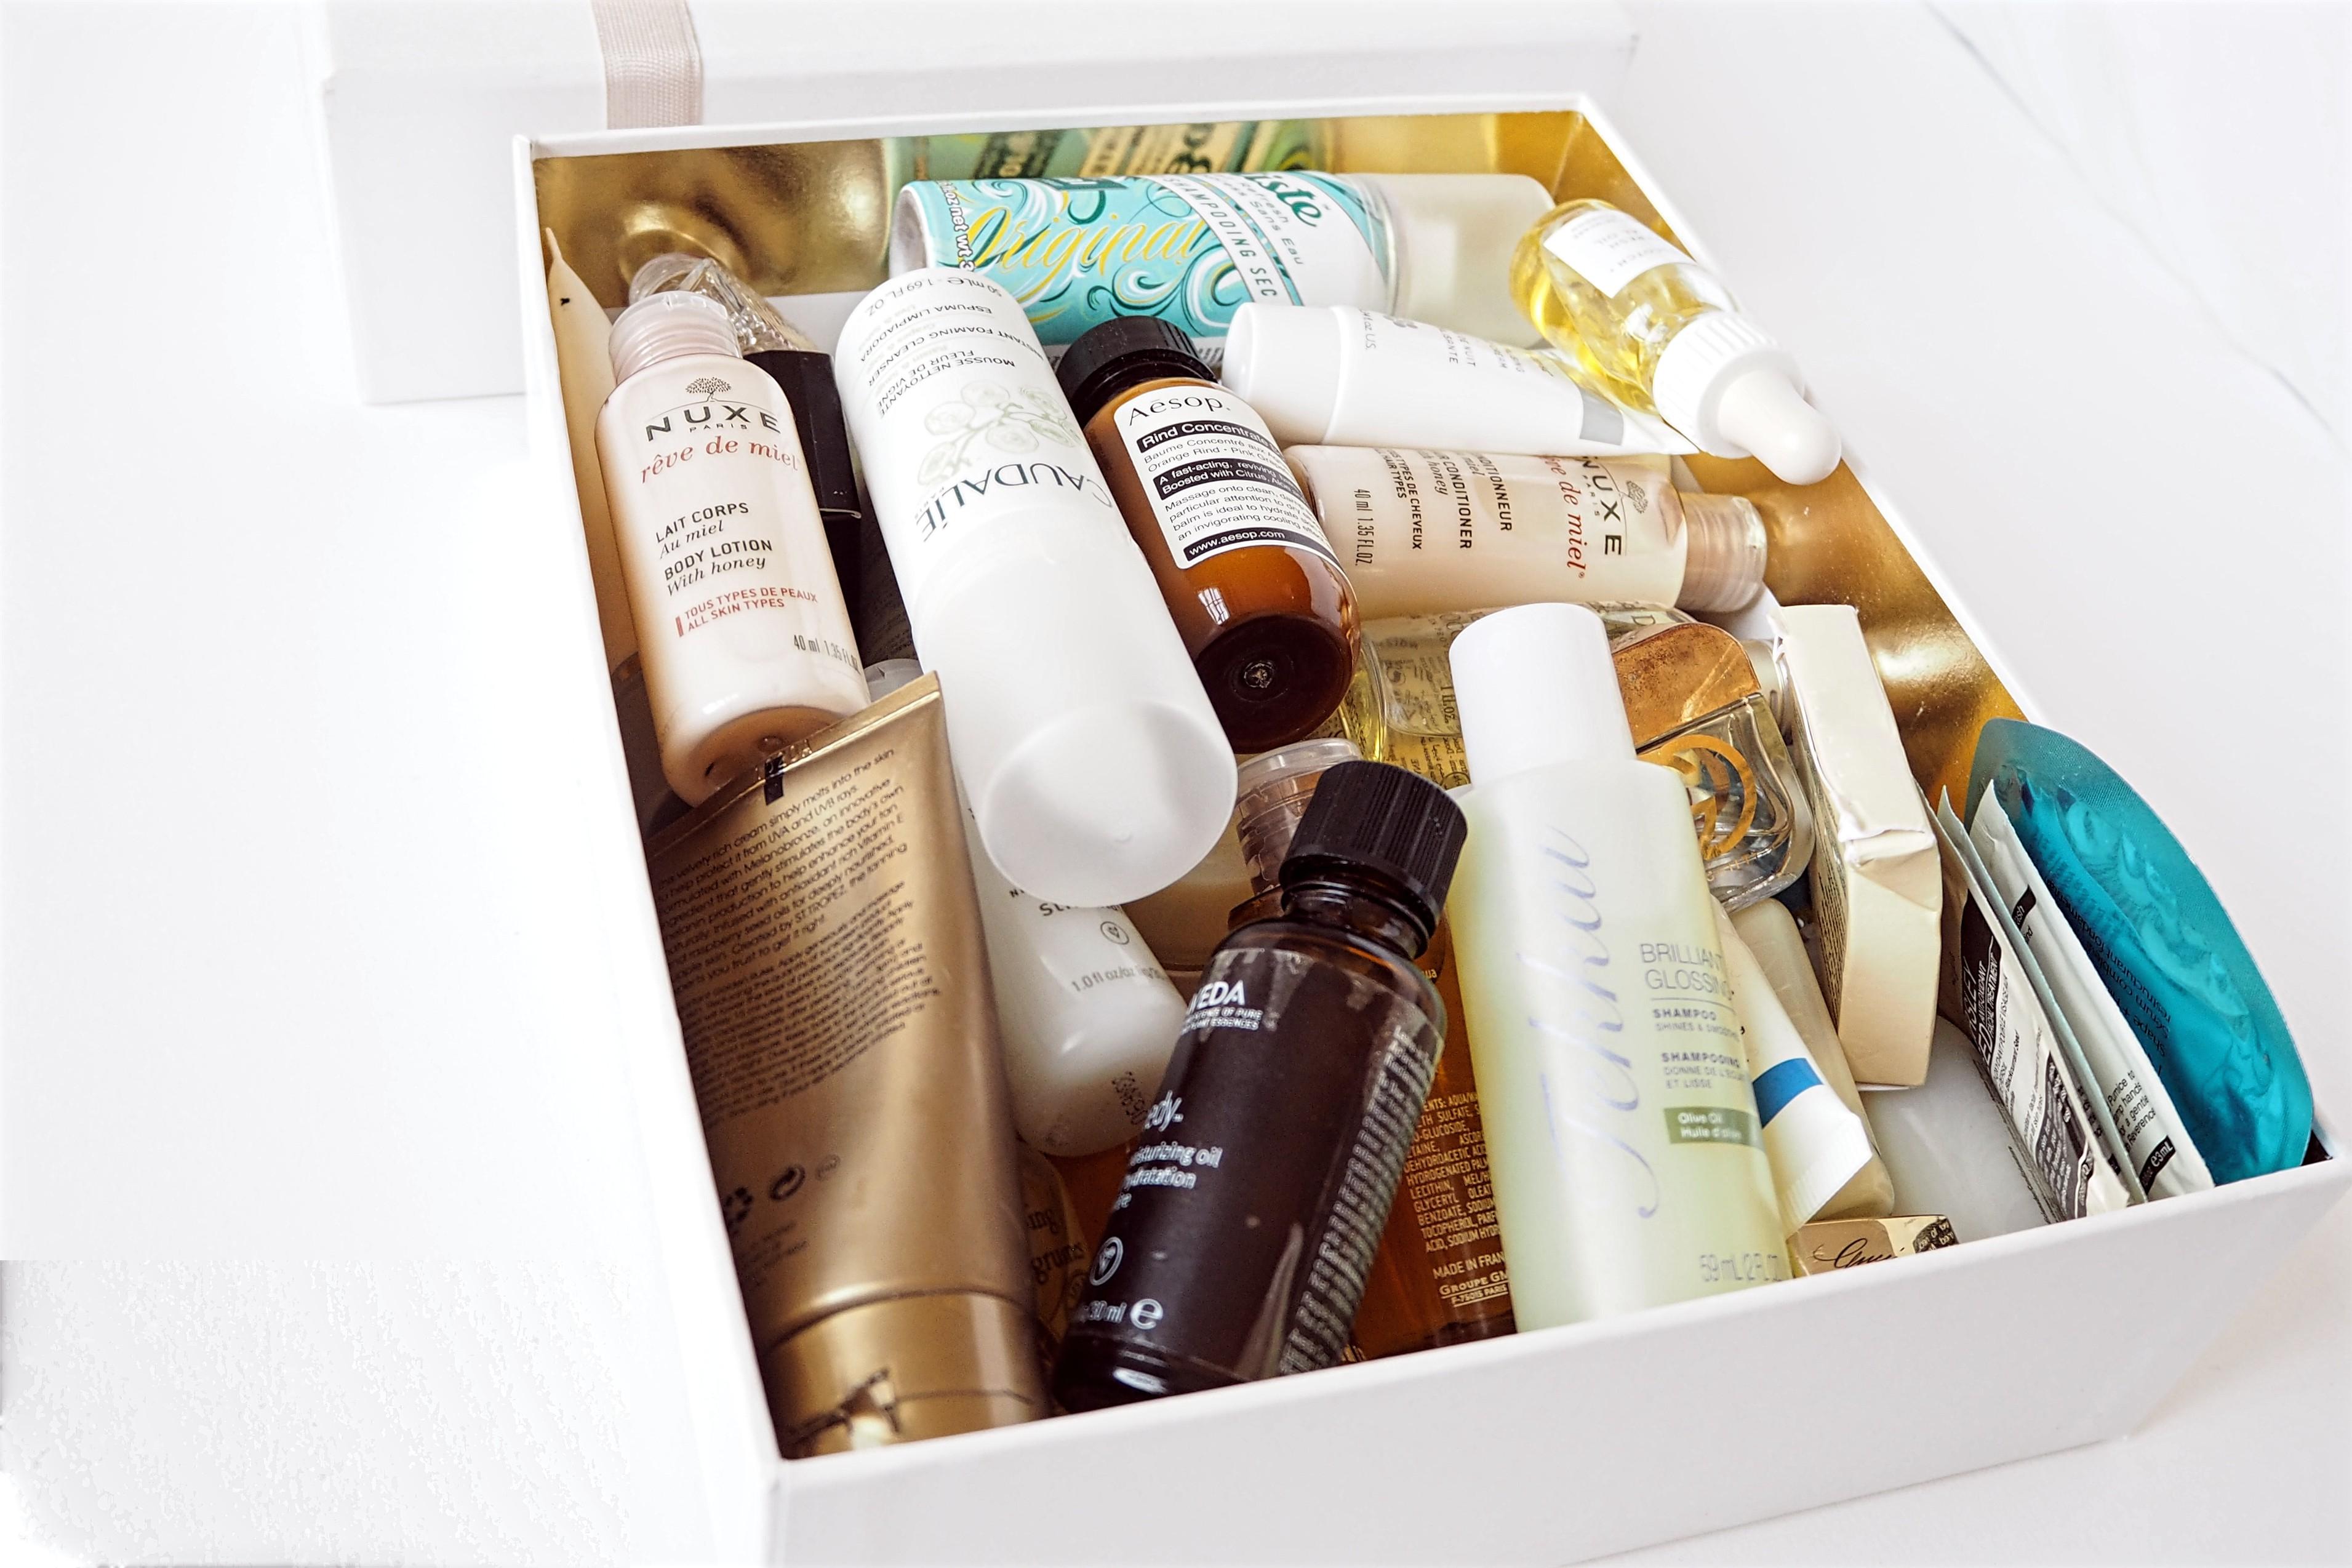 Travel Beauty - My Little Box of Horrors